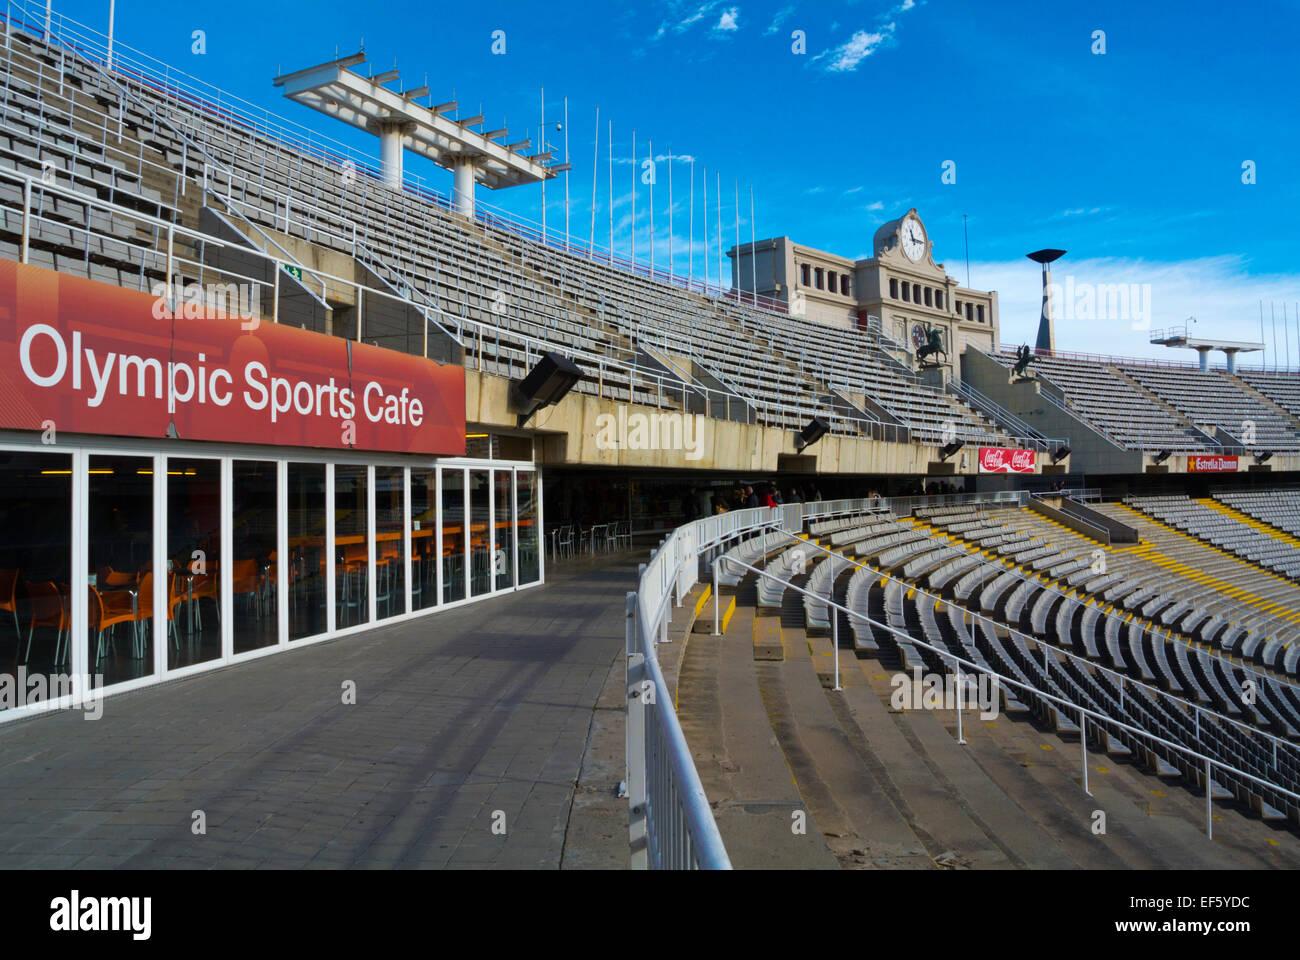 Estadi Olimpic Lluis Campanys, the Olympic Stadium, Montjuic, Barcelona, Spain - Stock Image